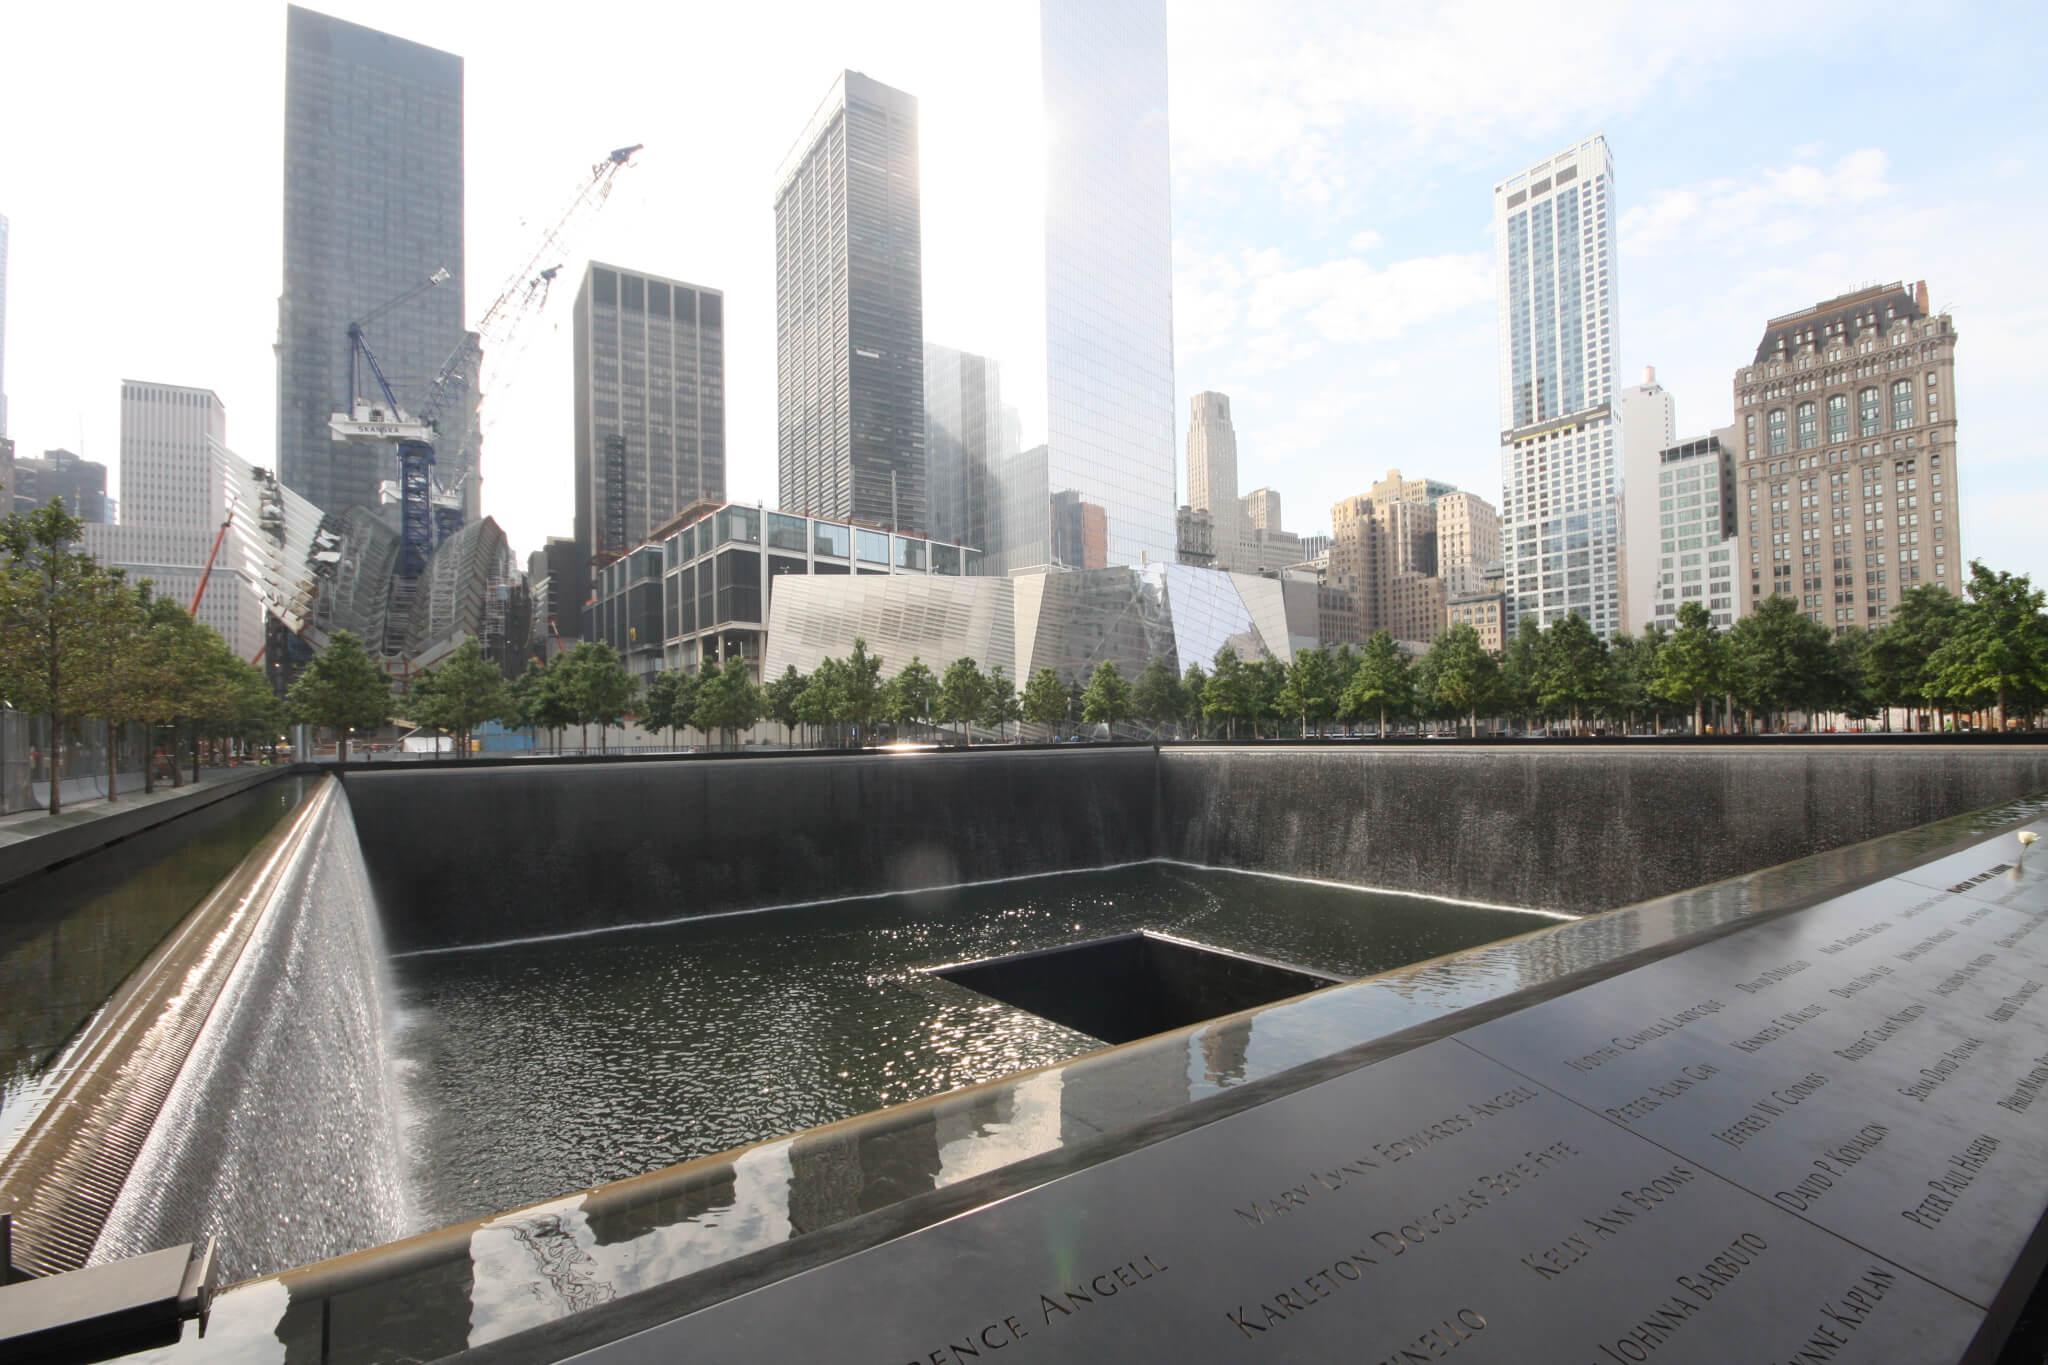 National September 11 Memorial and Museum, New York